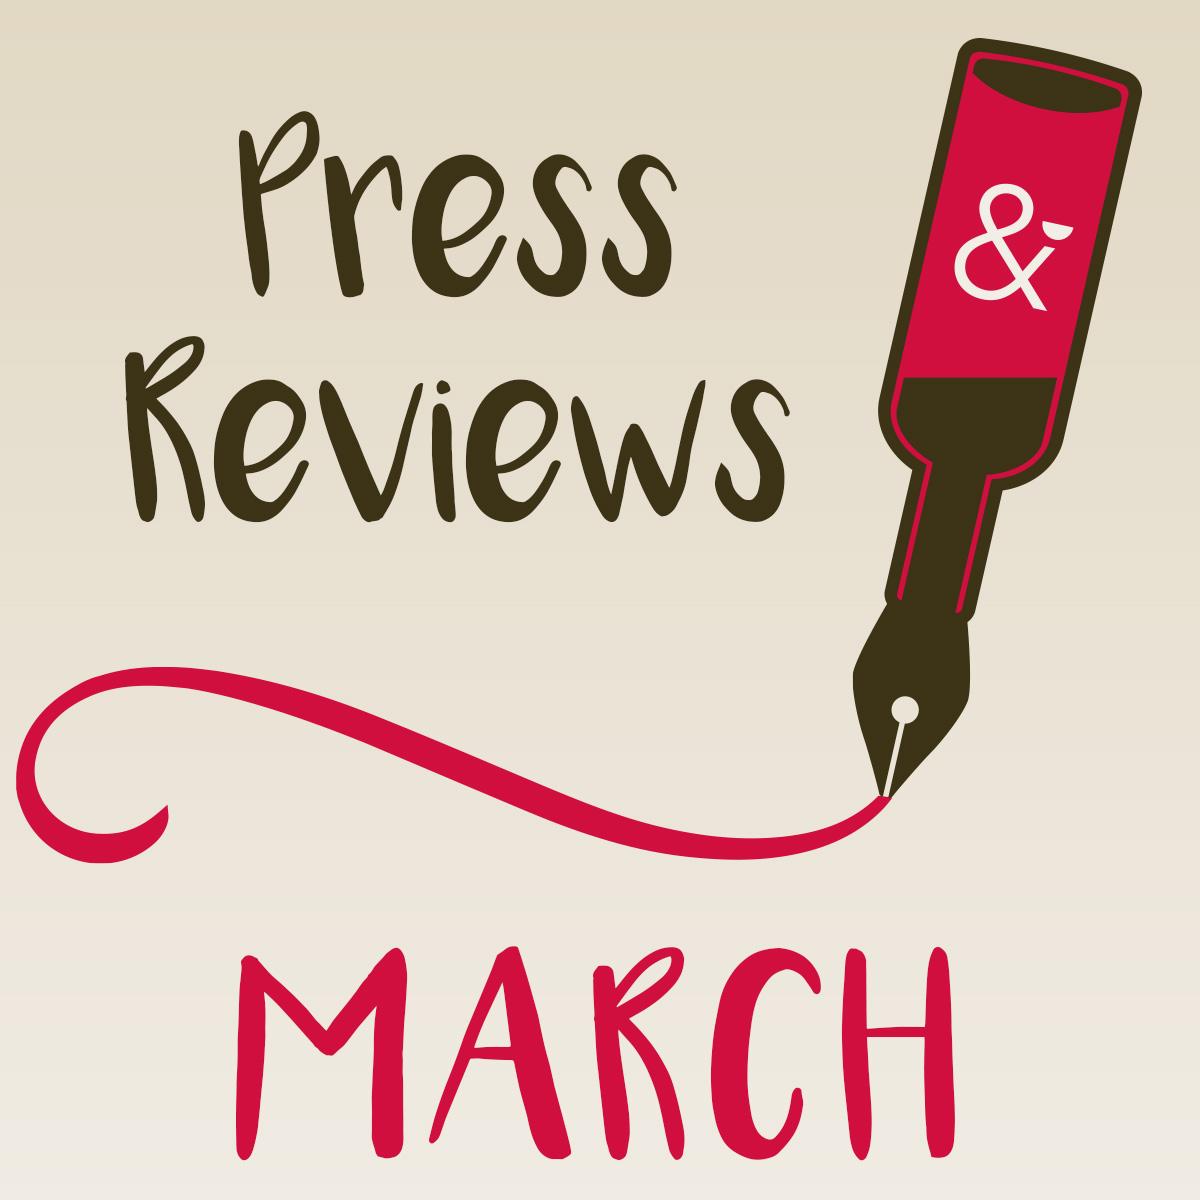 Press Reviews March